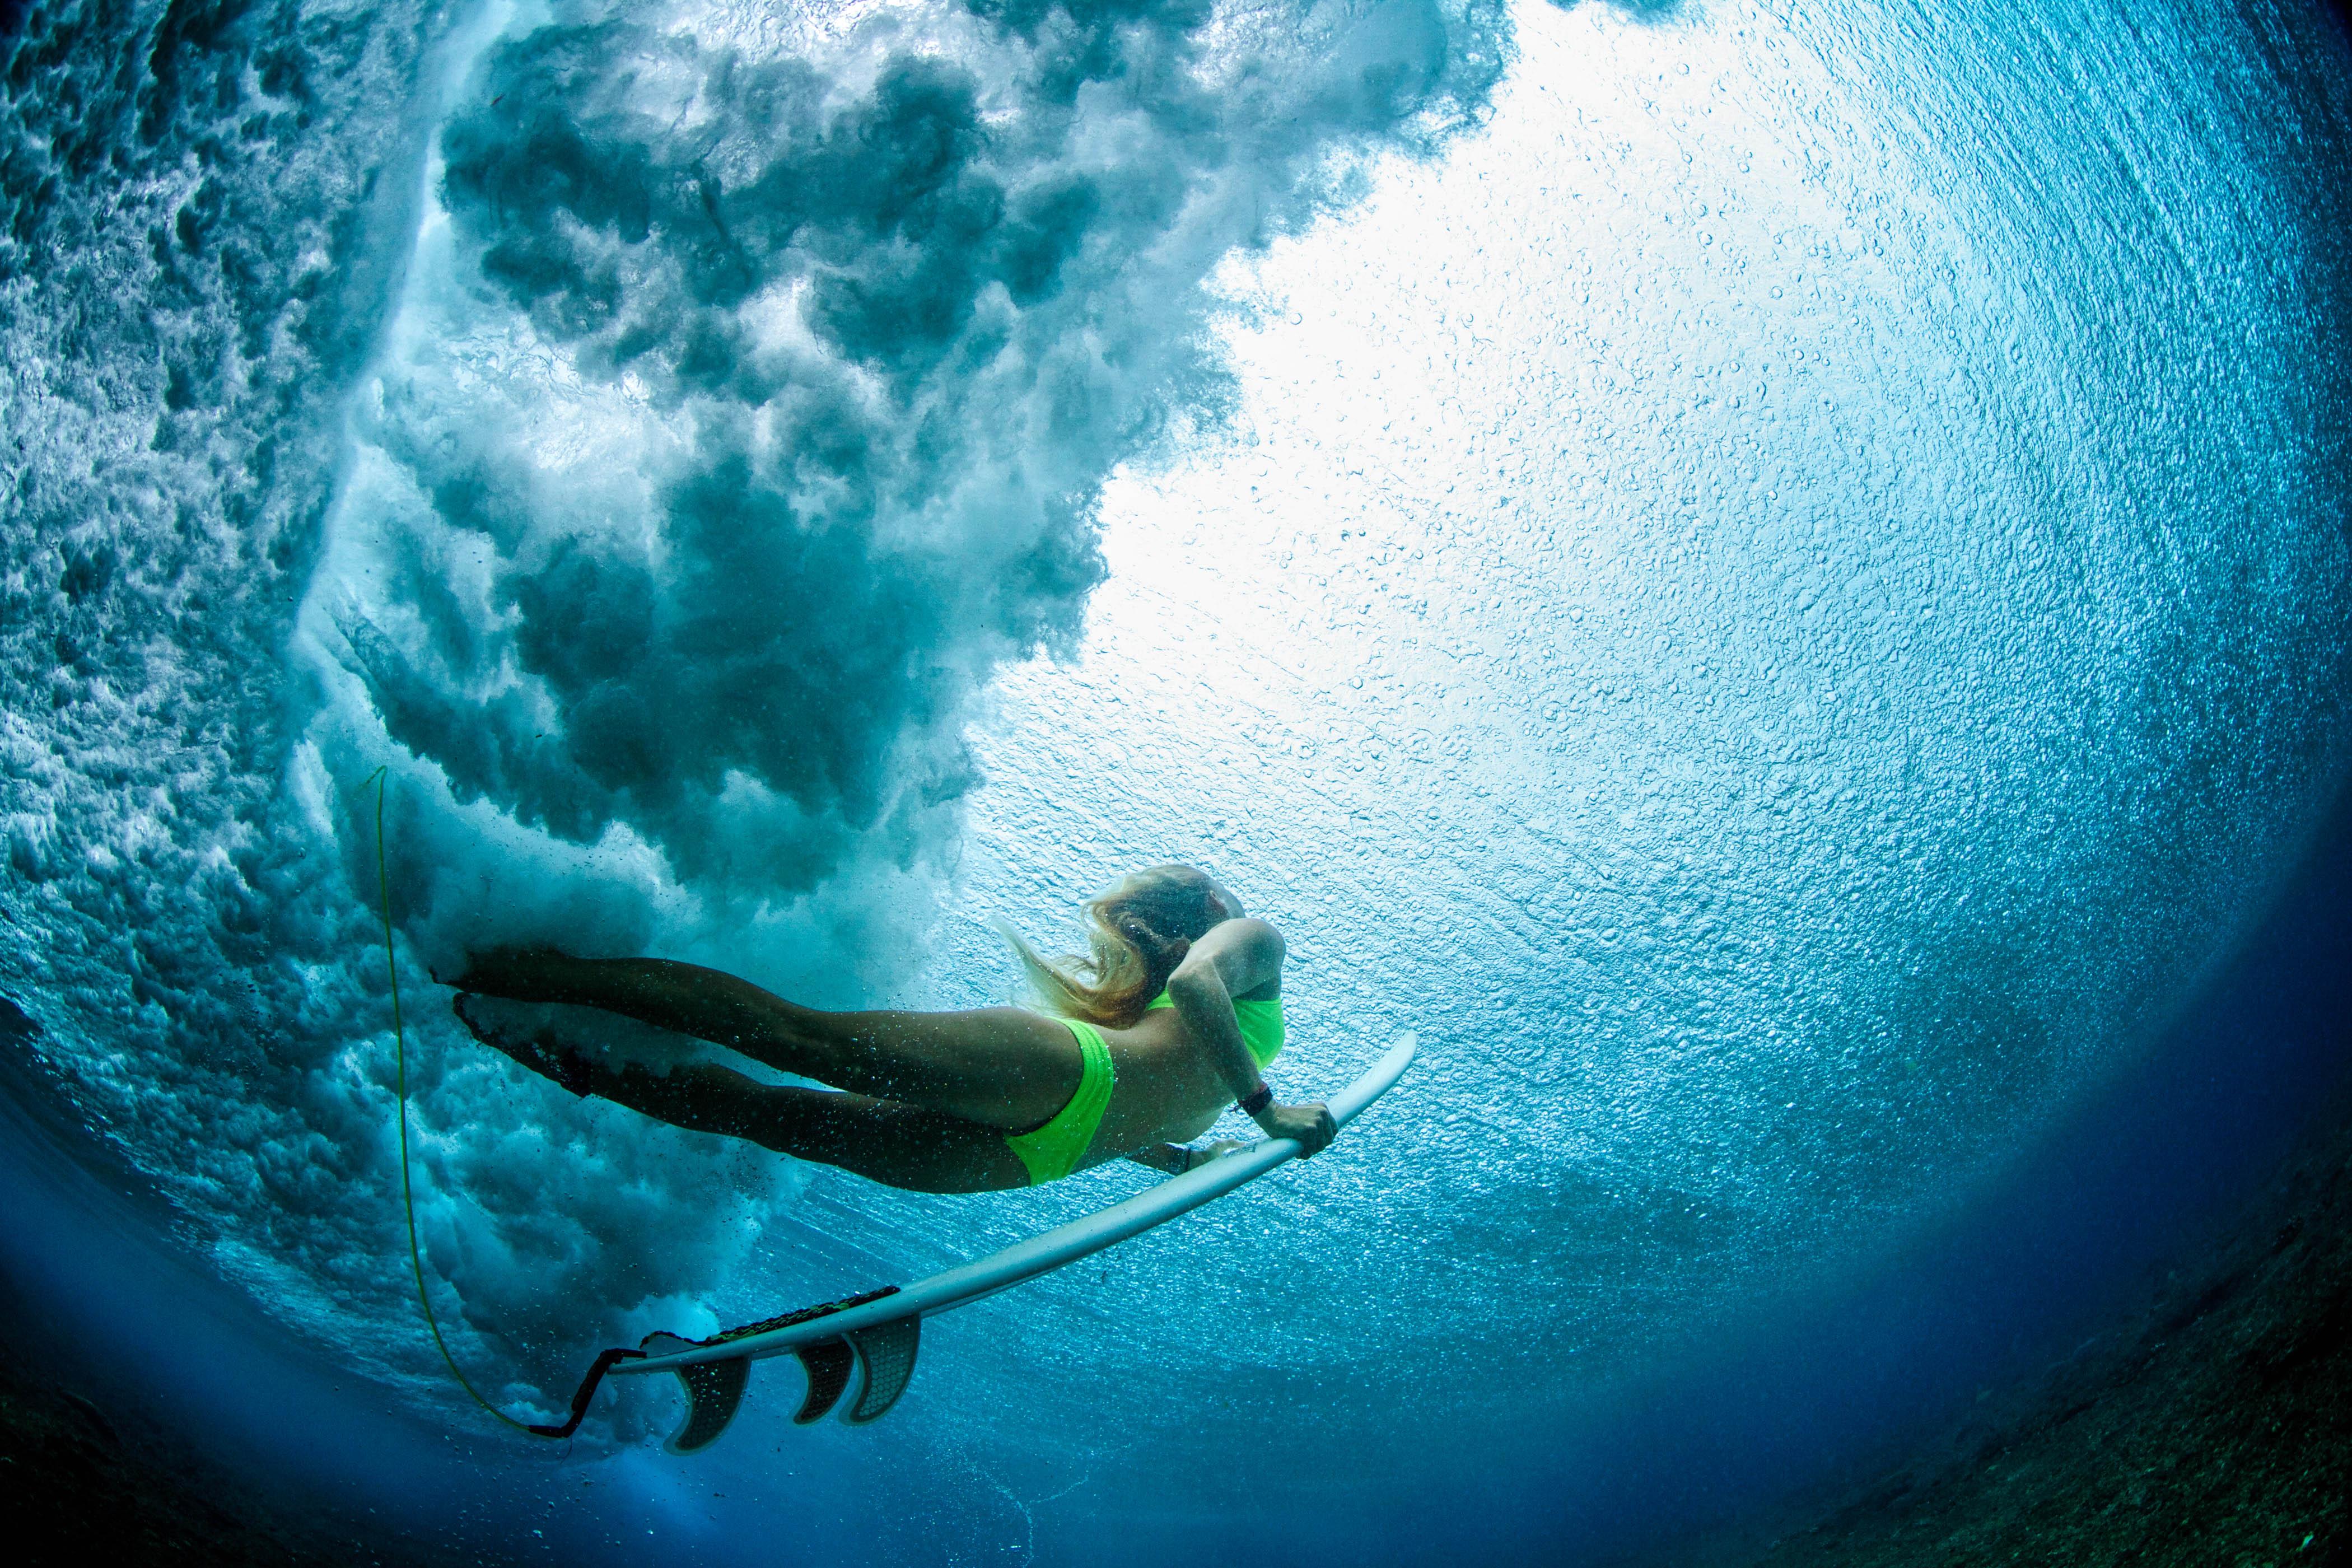 Malediven, Sports, Surfing